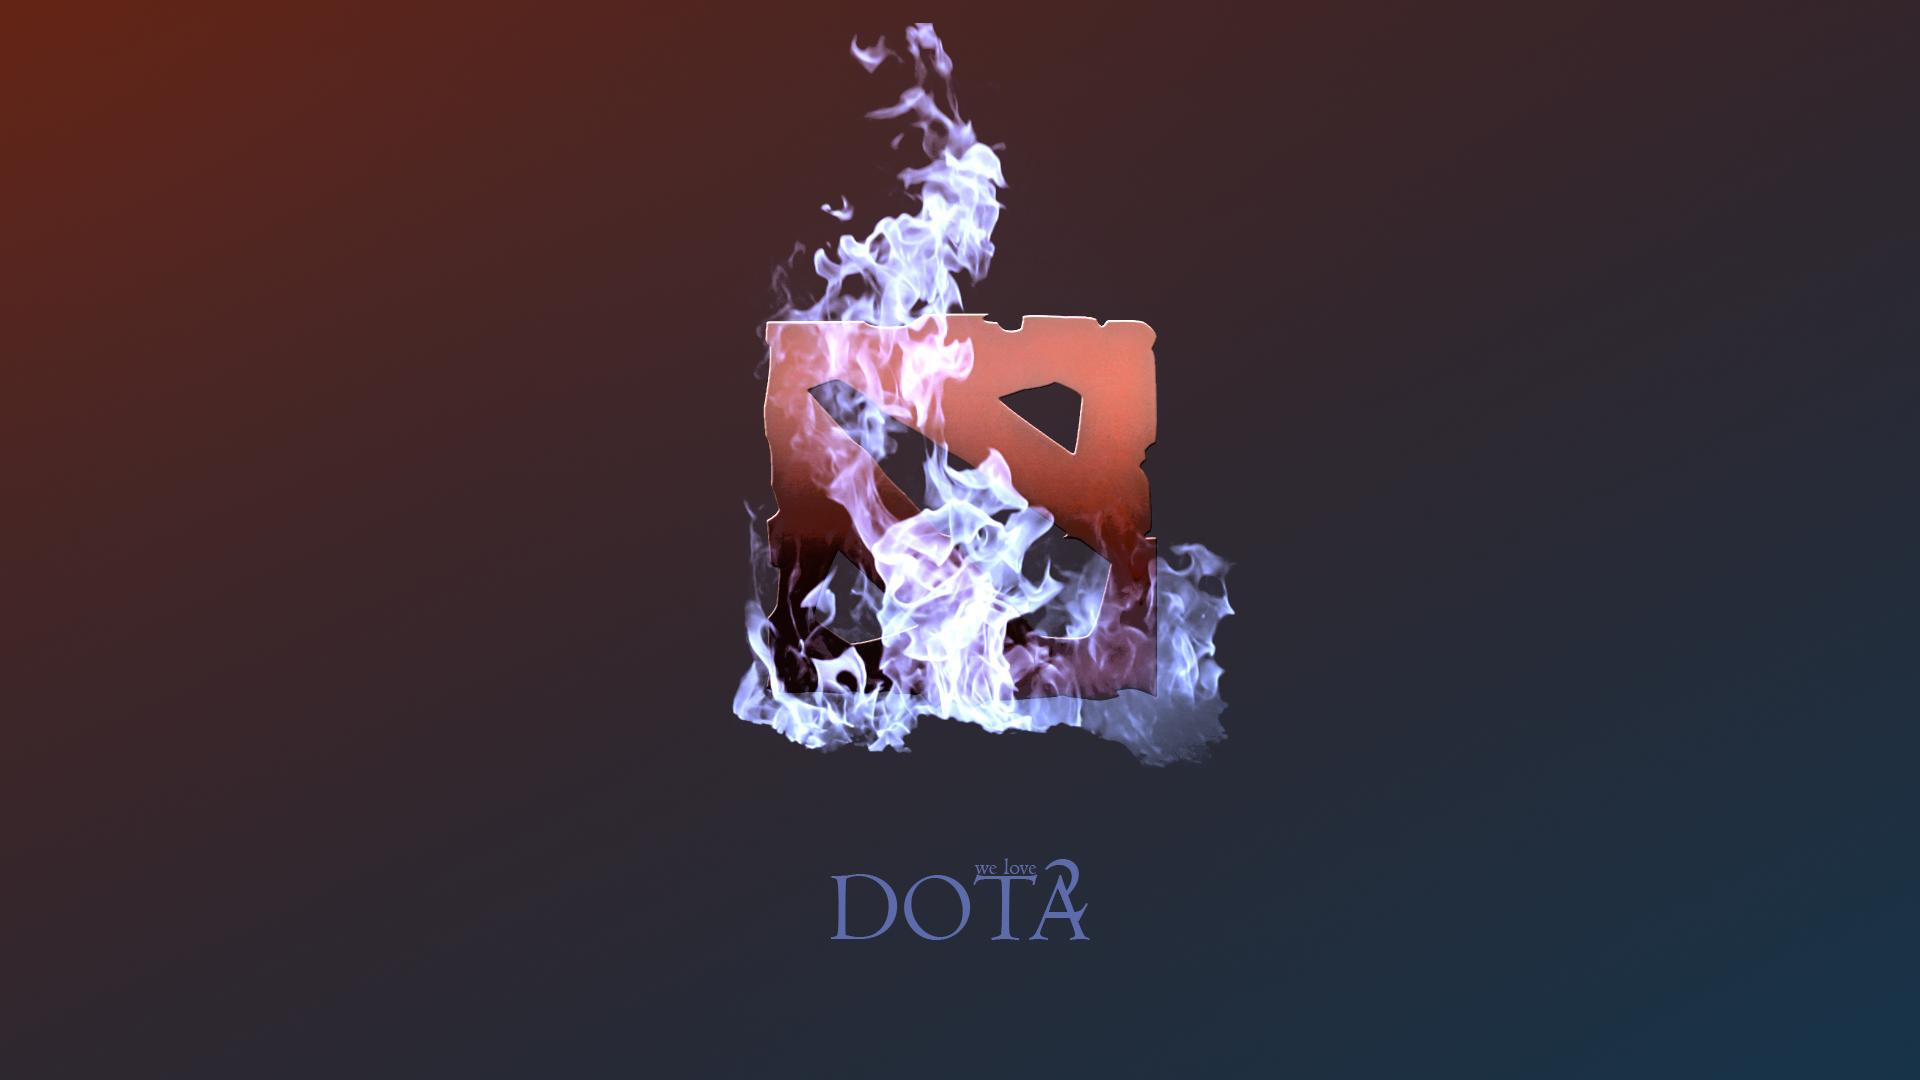 dota 2 game background - photo #45